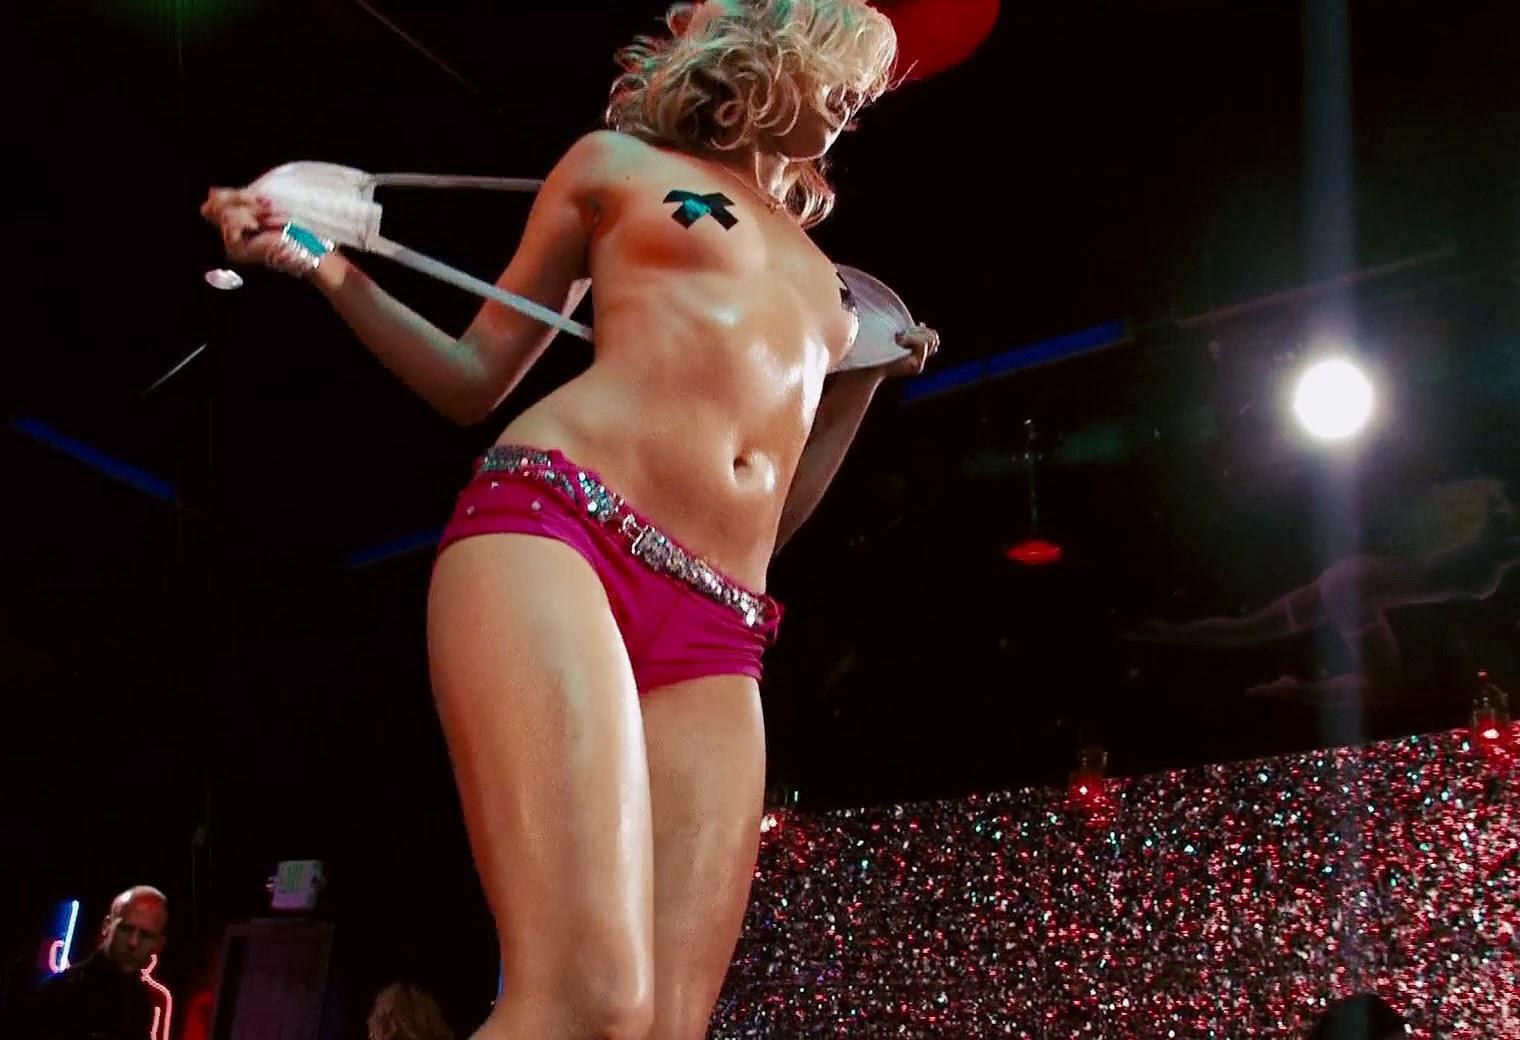 Amy Smart Crank 2 Nude saltoalexterior: amy smart's naked vagina & nipple pasties